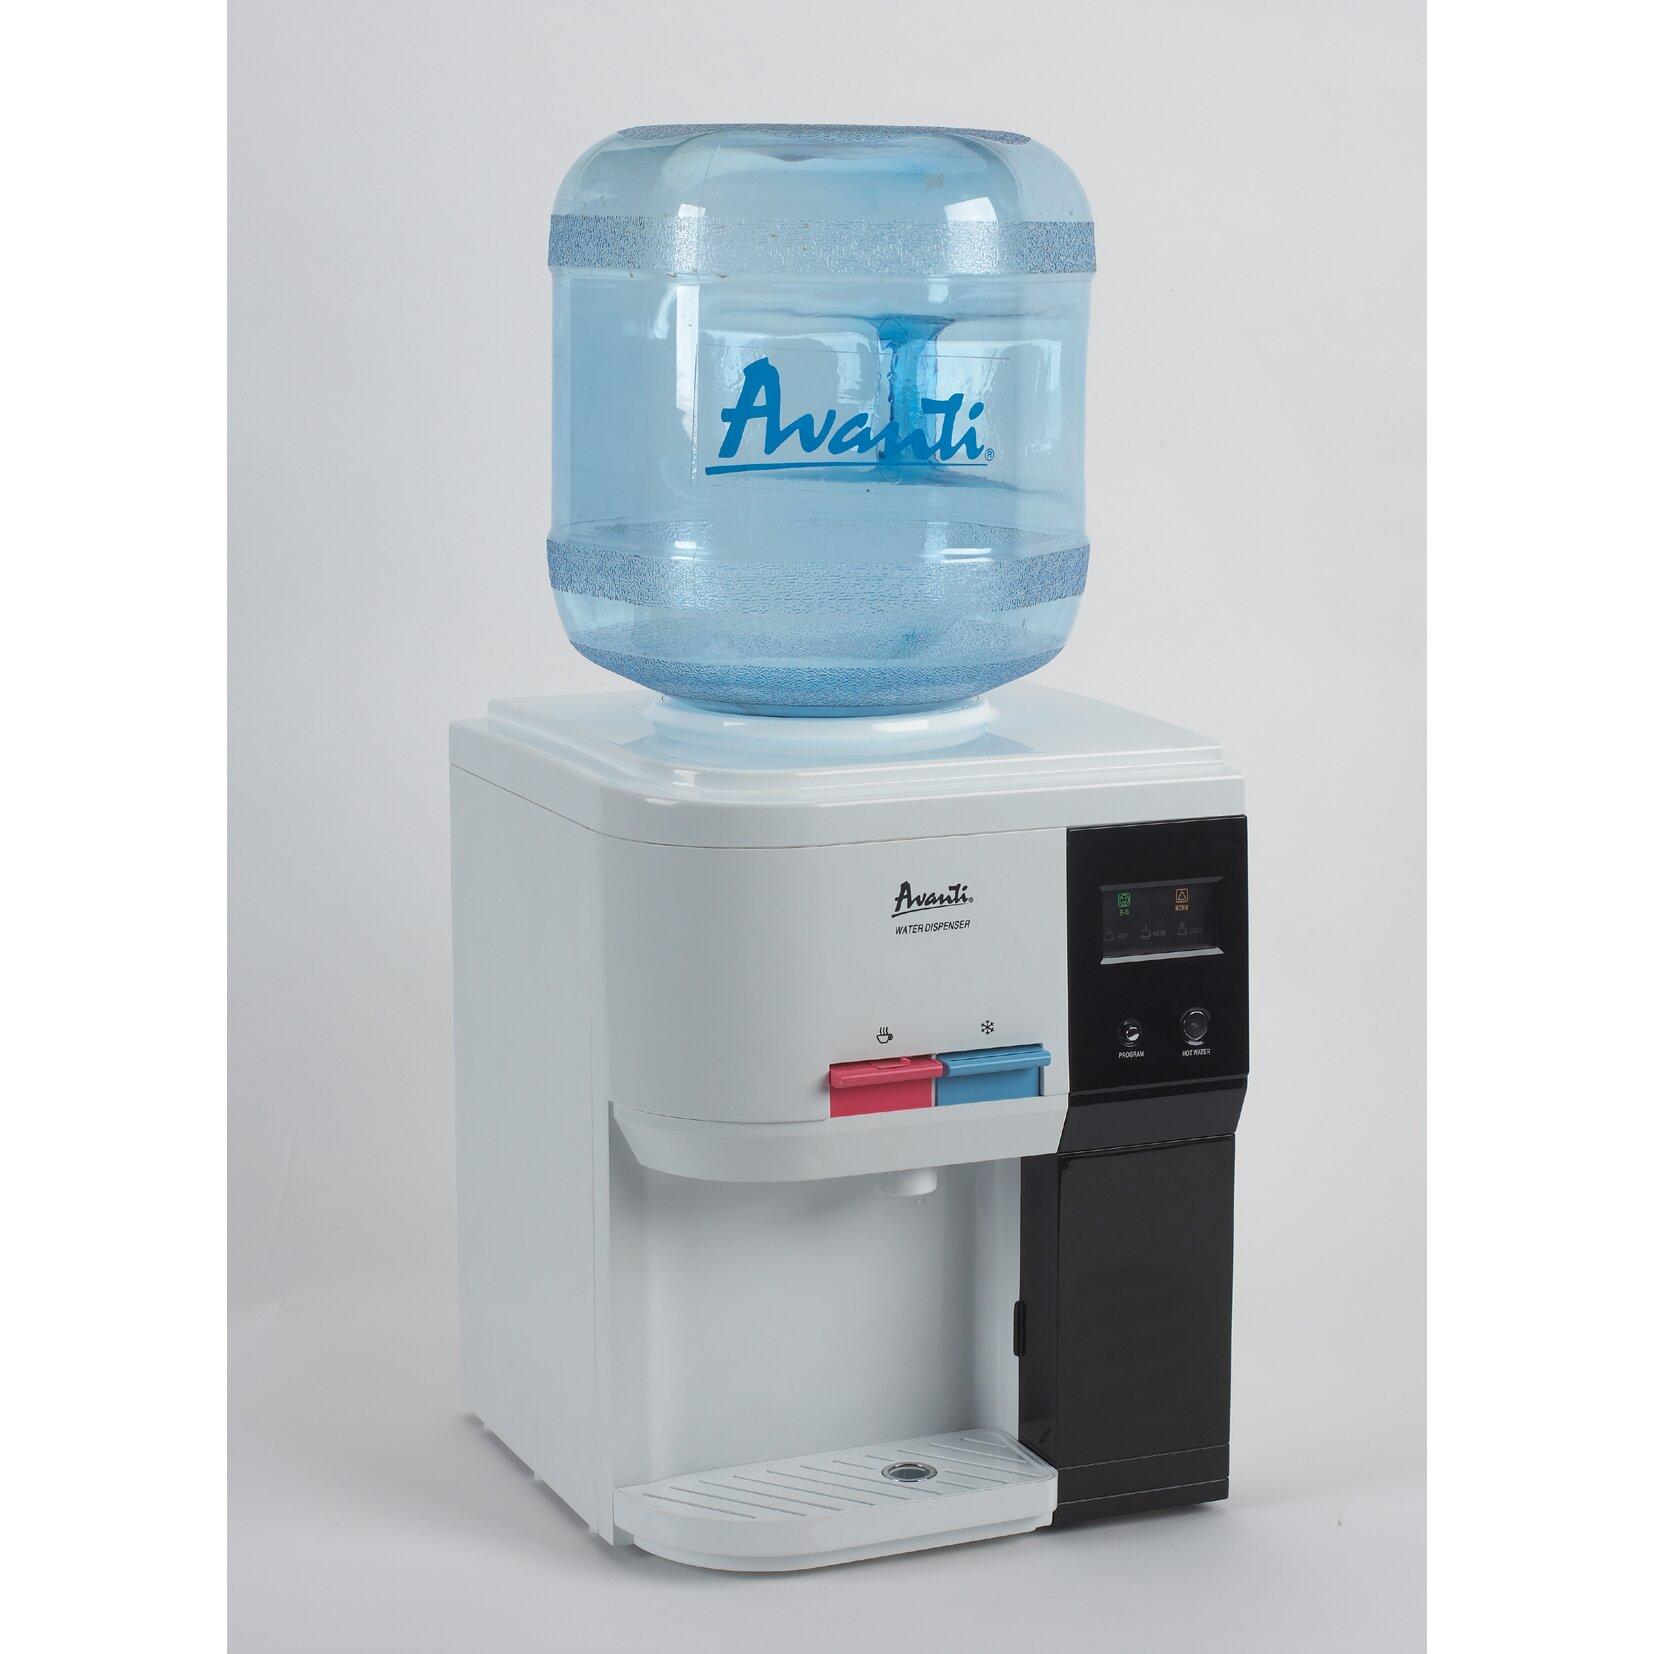 Countertop Hot And Cold Water Dispenser : Avanti Countertop Hot and Cold Water Cooler & Reviews Wayfair